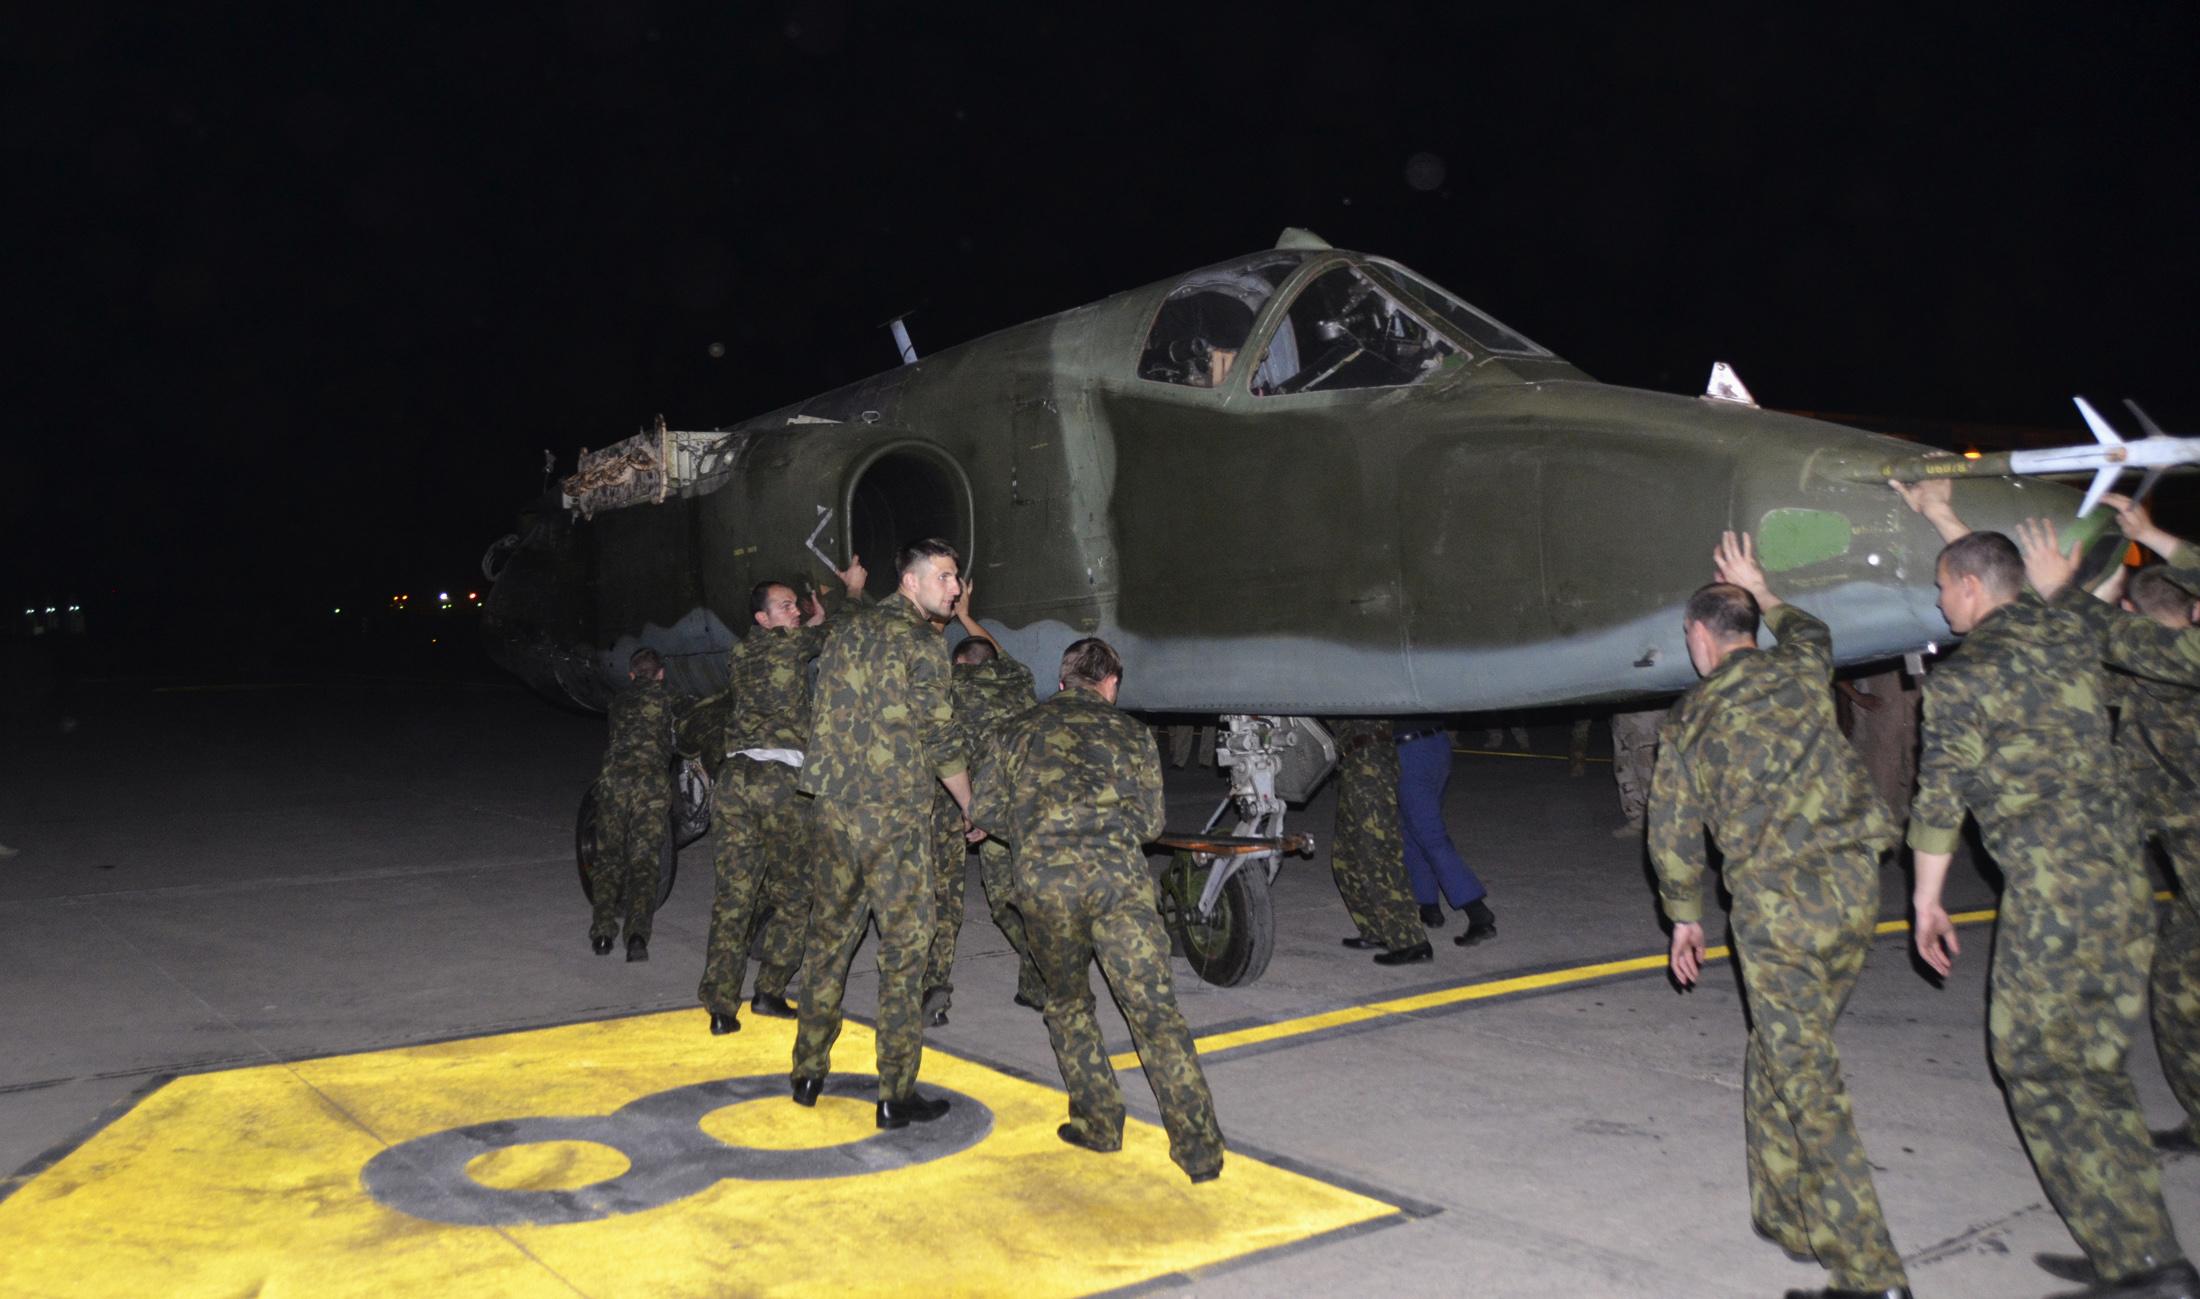 Russian troops unload a Russian Su-25 attack plane in Baghdad on Saturday.